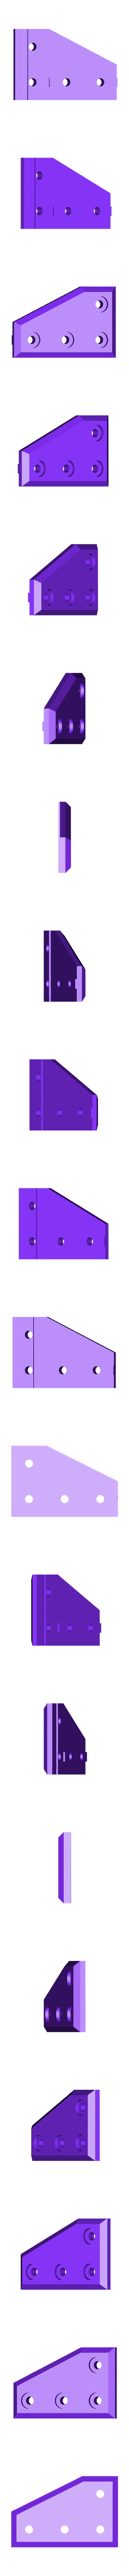 2020_Corner_Delta_4Screw_V2.stl Download free STL file 2020 Profile Aluminum 3D Printable Erector Set • 3D printer model, adamjvr